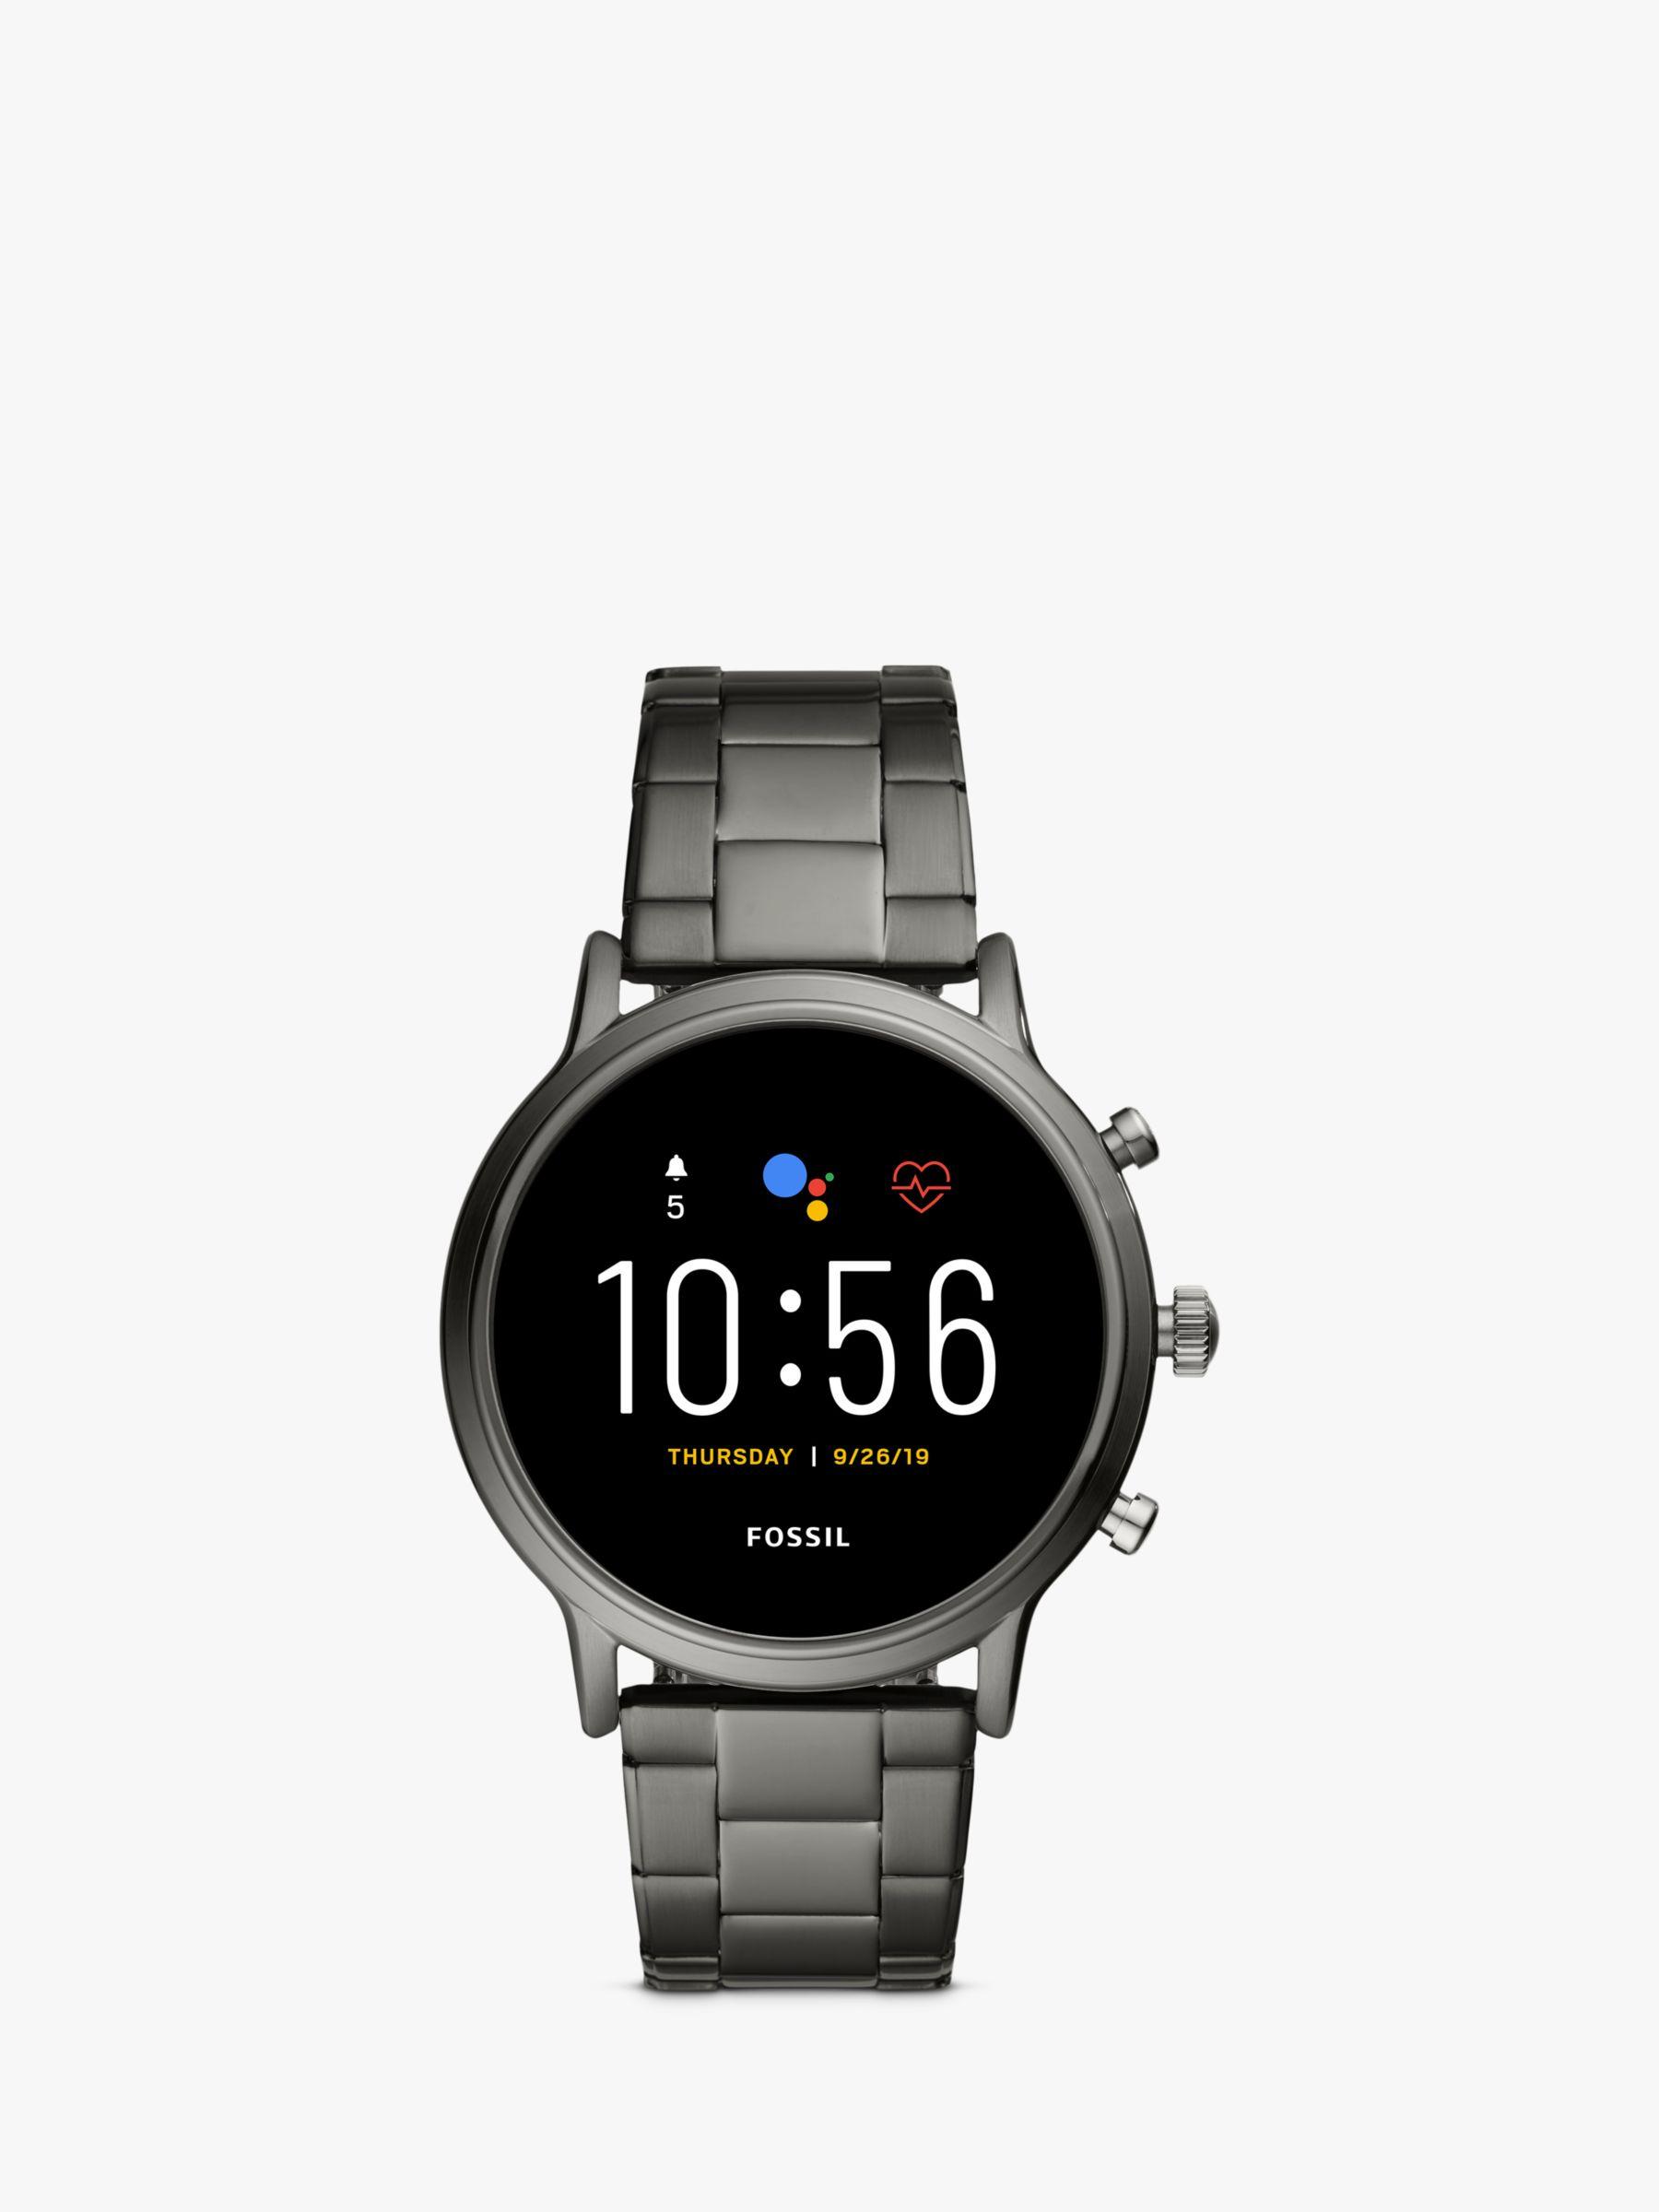 Fossil Fossil Q FTW4024 Men's Bracelet Strap Touch Screen Smartwatch, Grey/Black